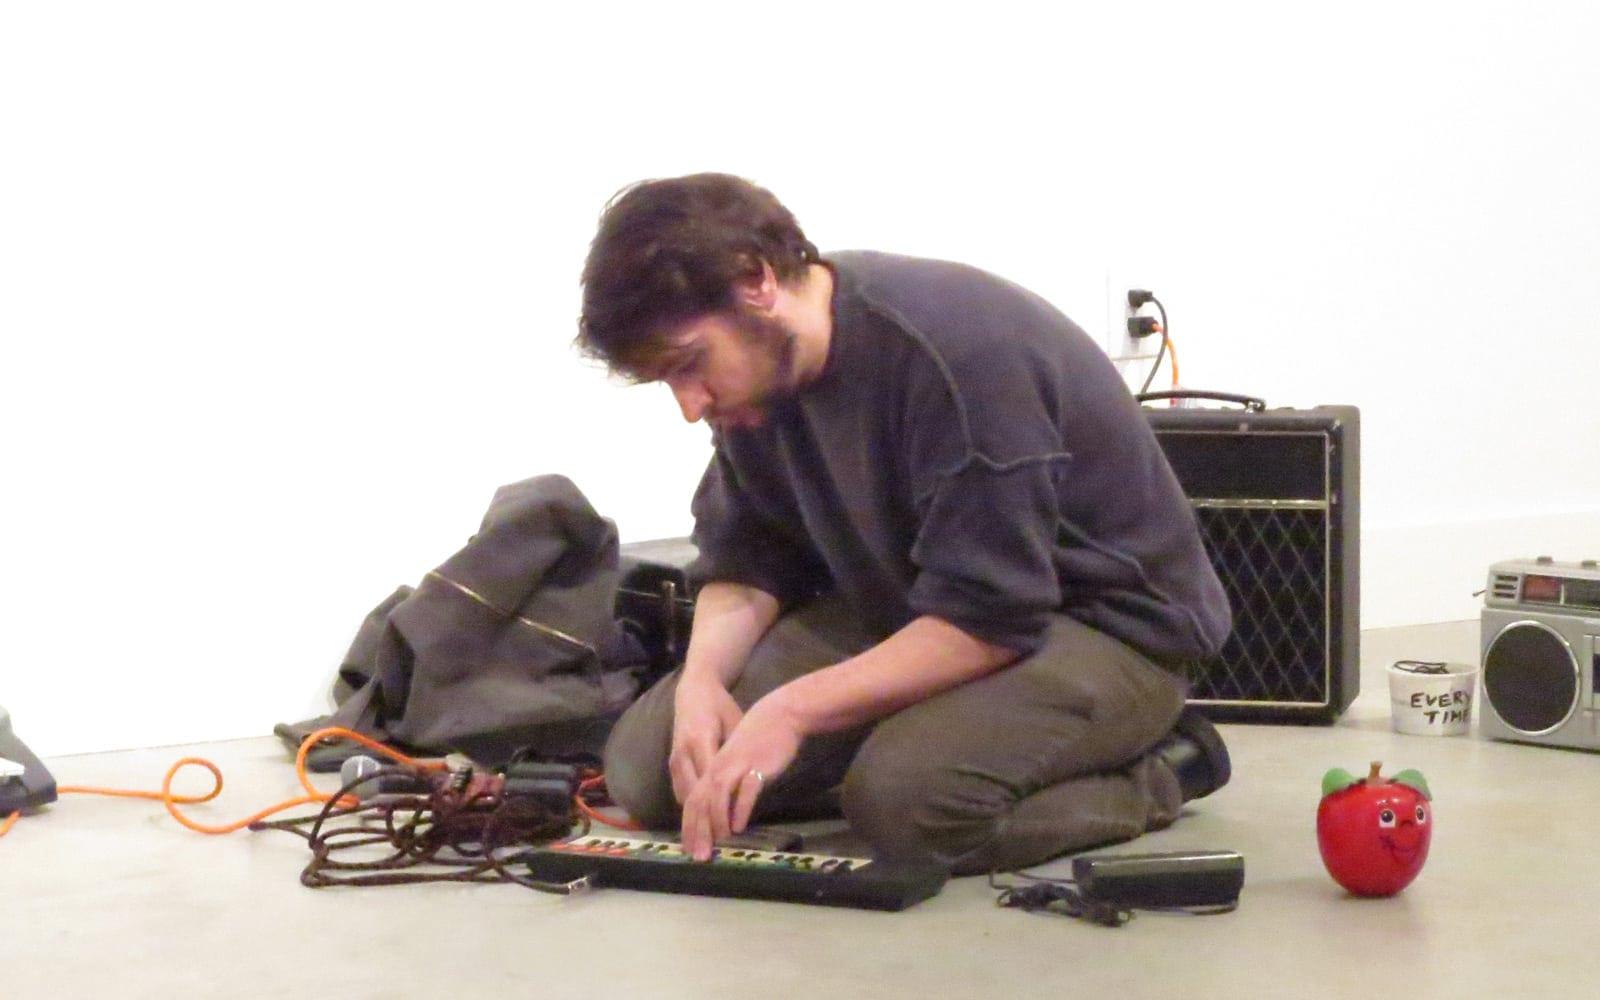 Cedro Danado performed with a toy keyboard. (Photo by Mark Gresham)